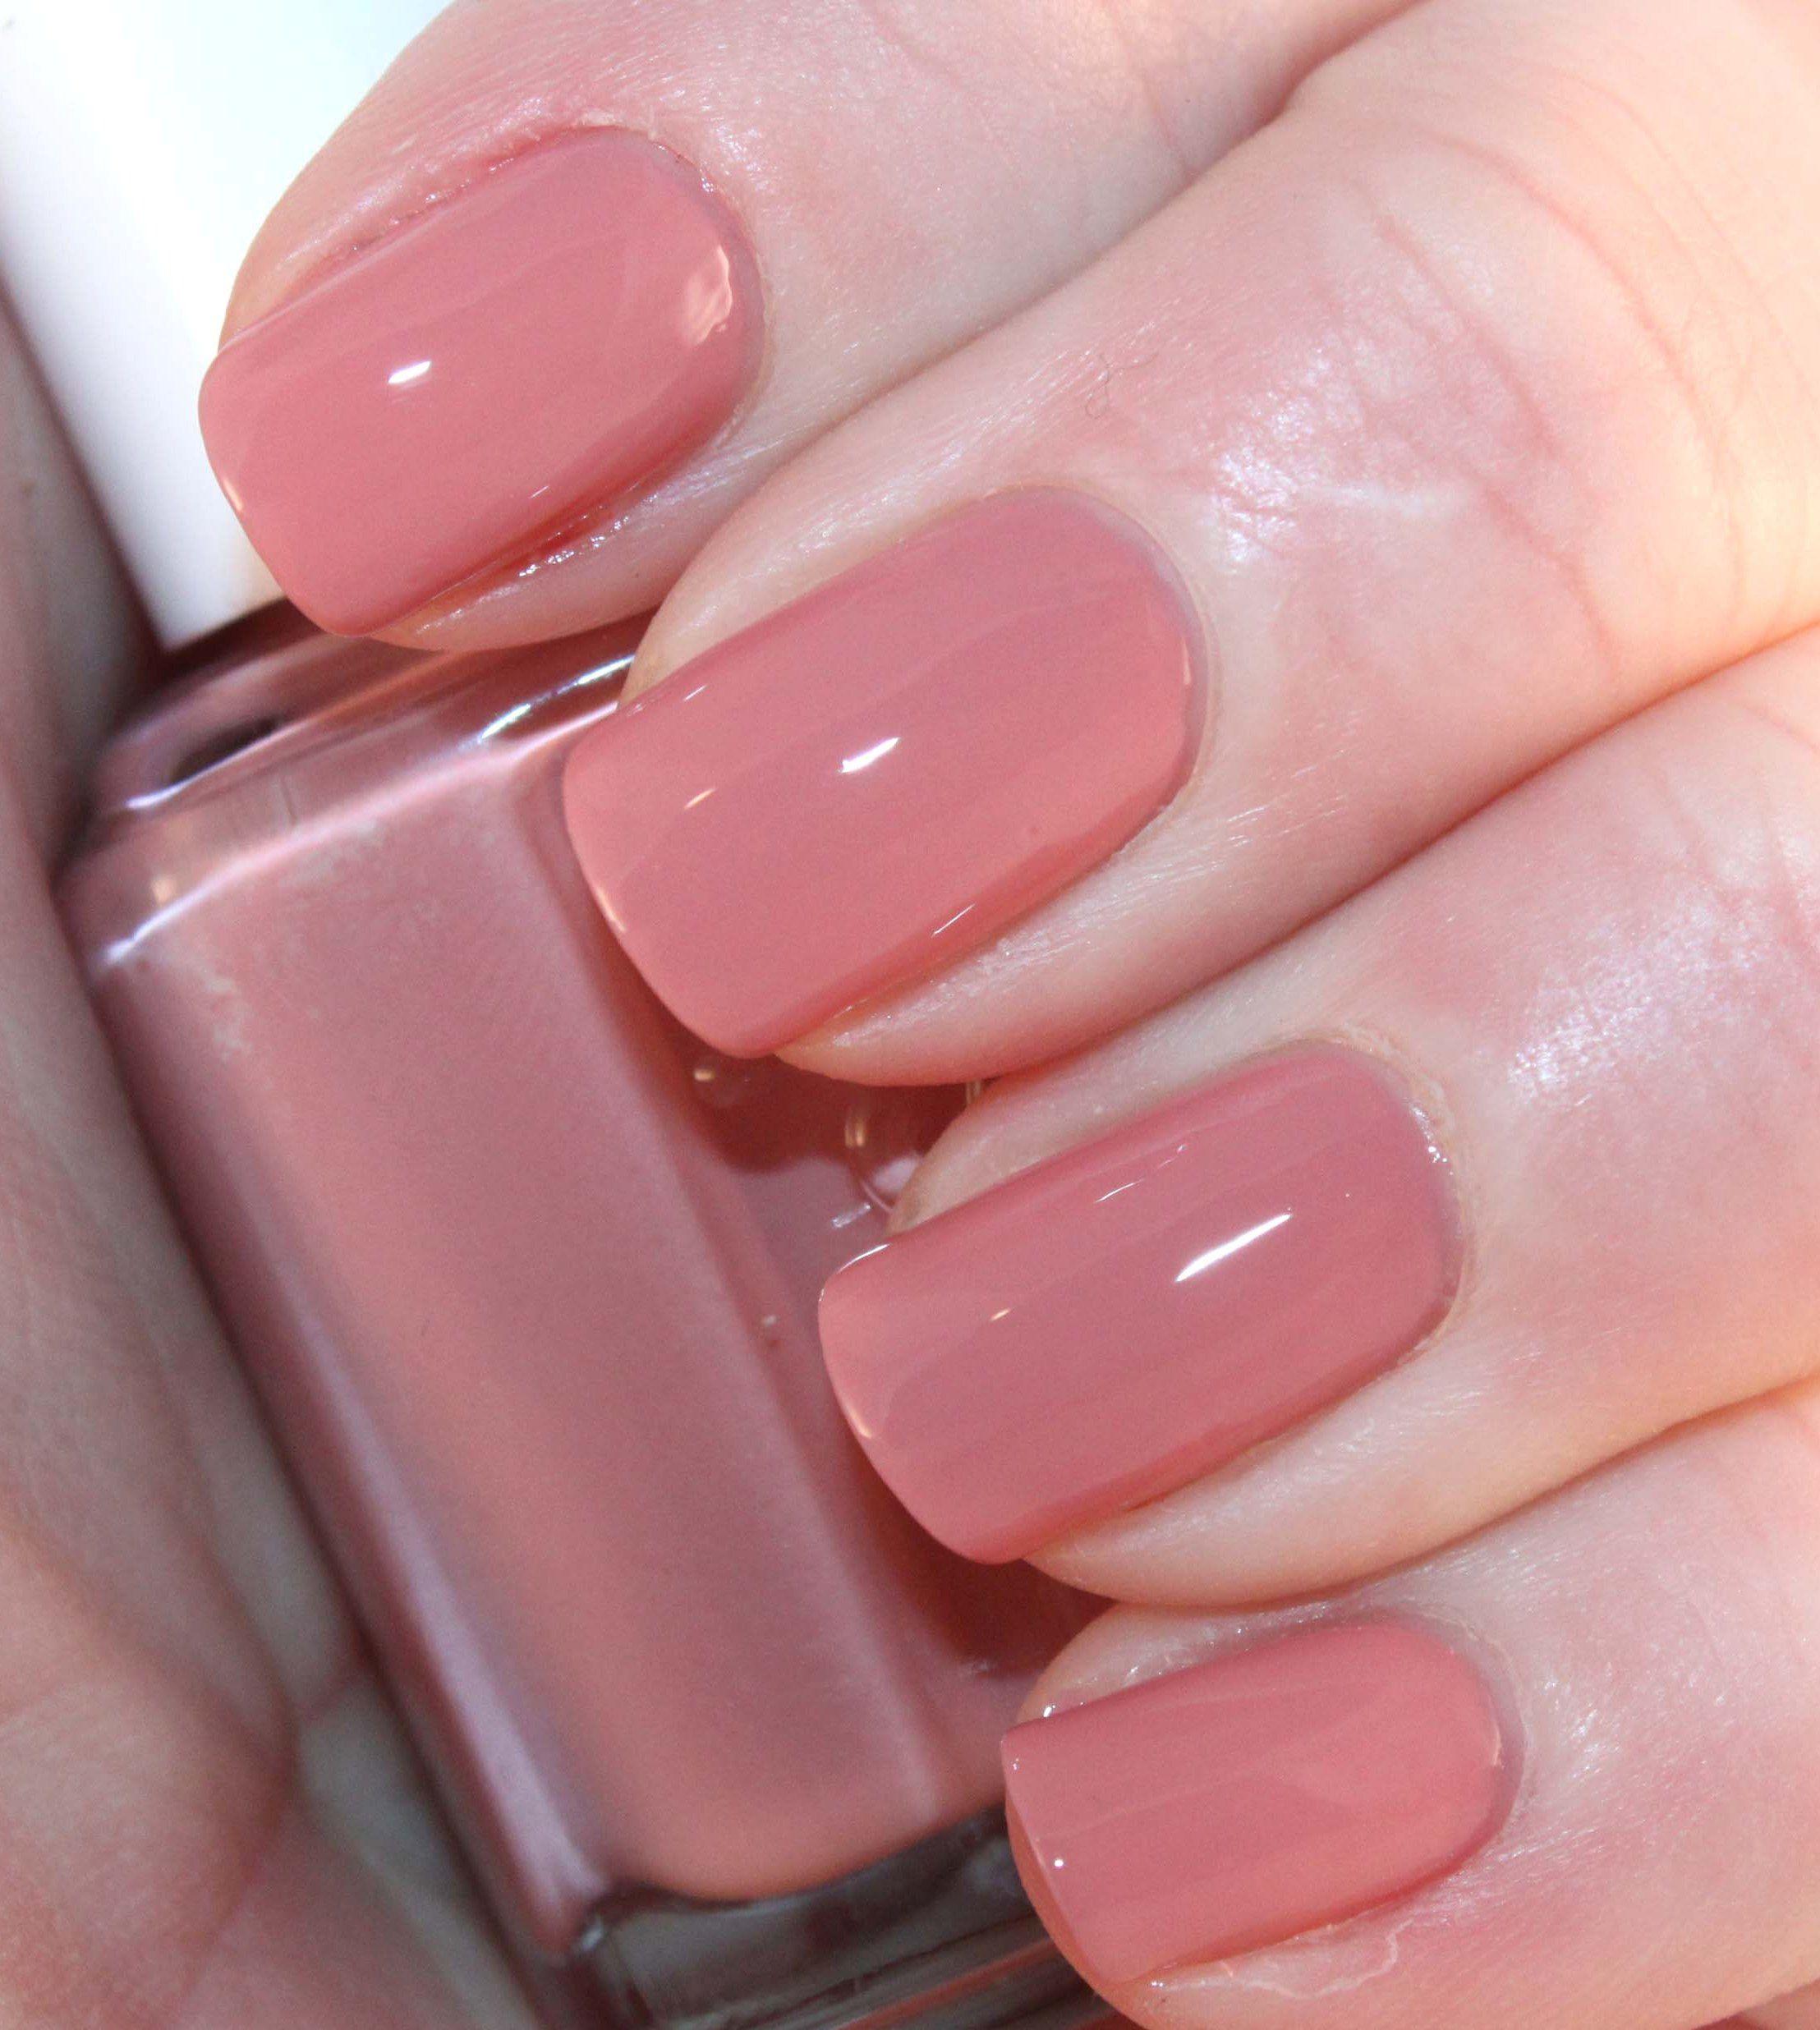 Nail Polish Colors Essie: Essie Fondola Gondola. Very Pretty Spring/summer Pick.